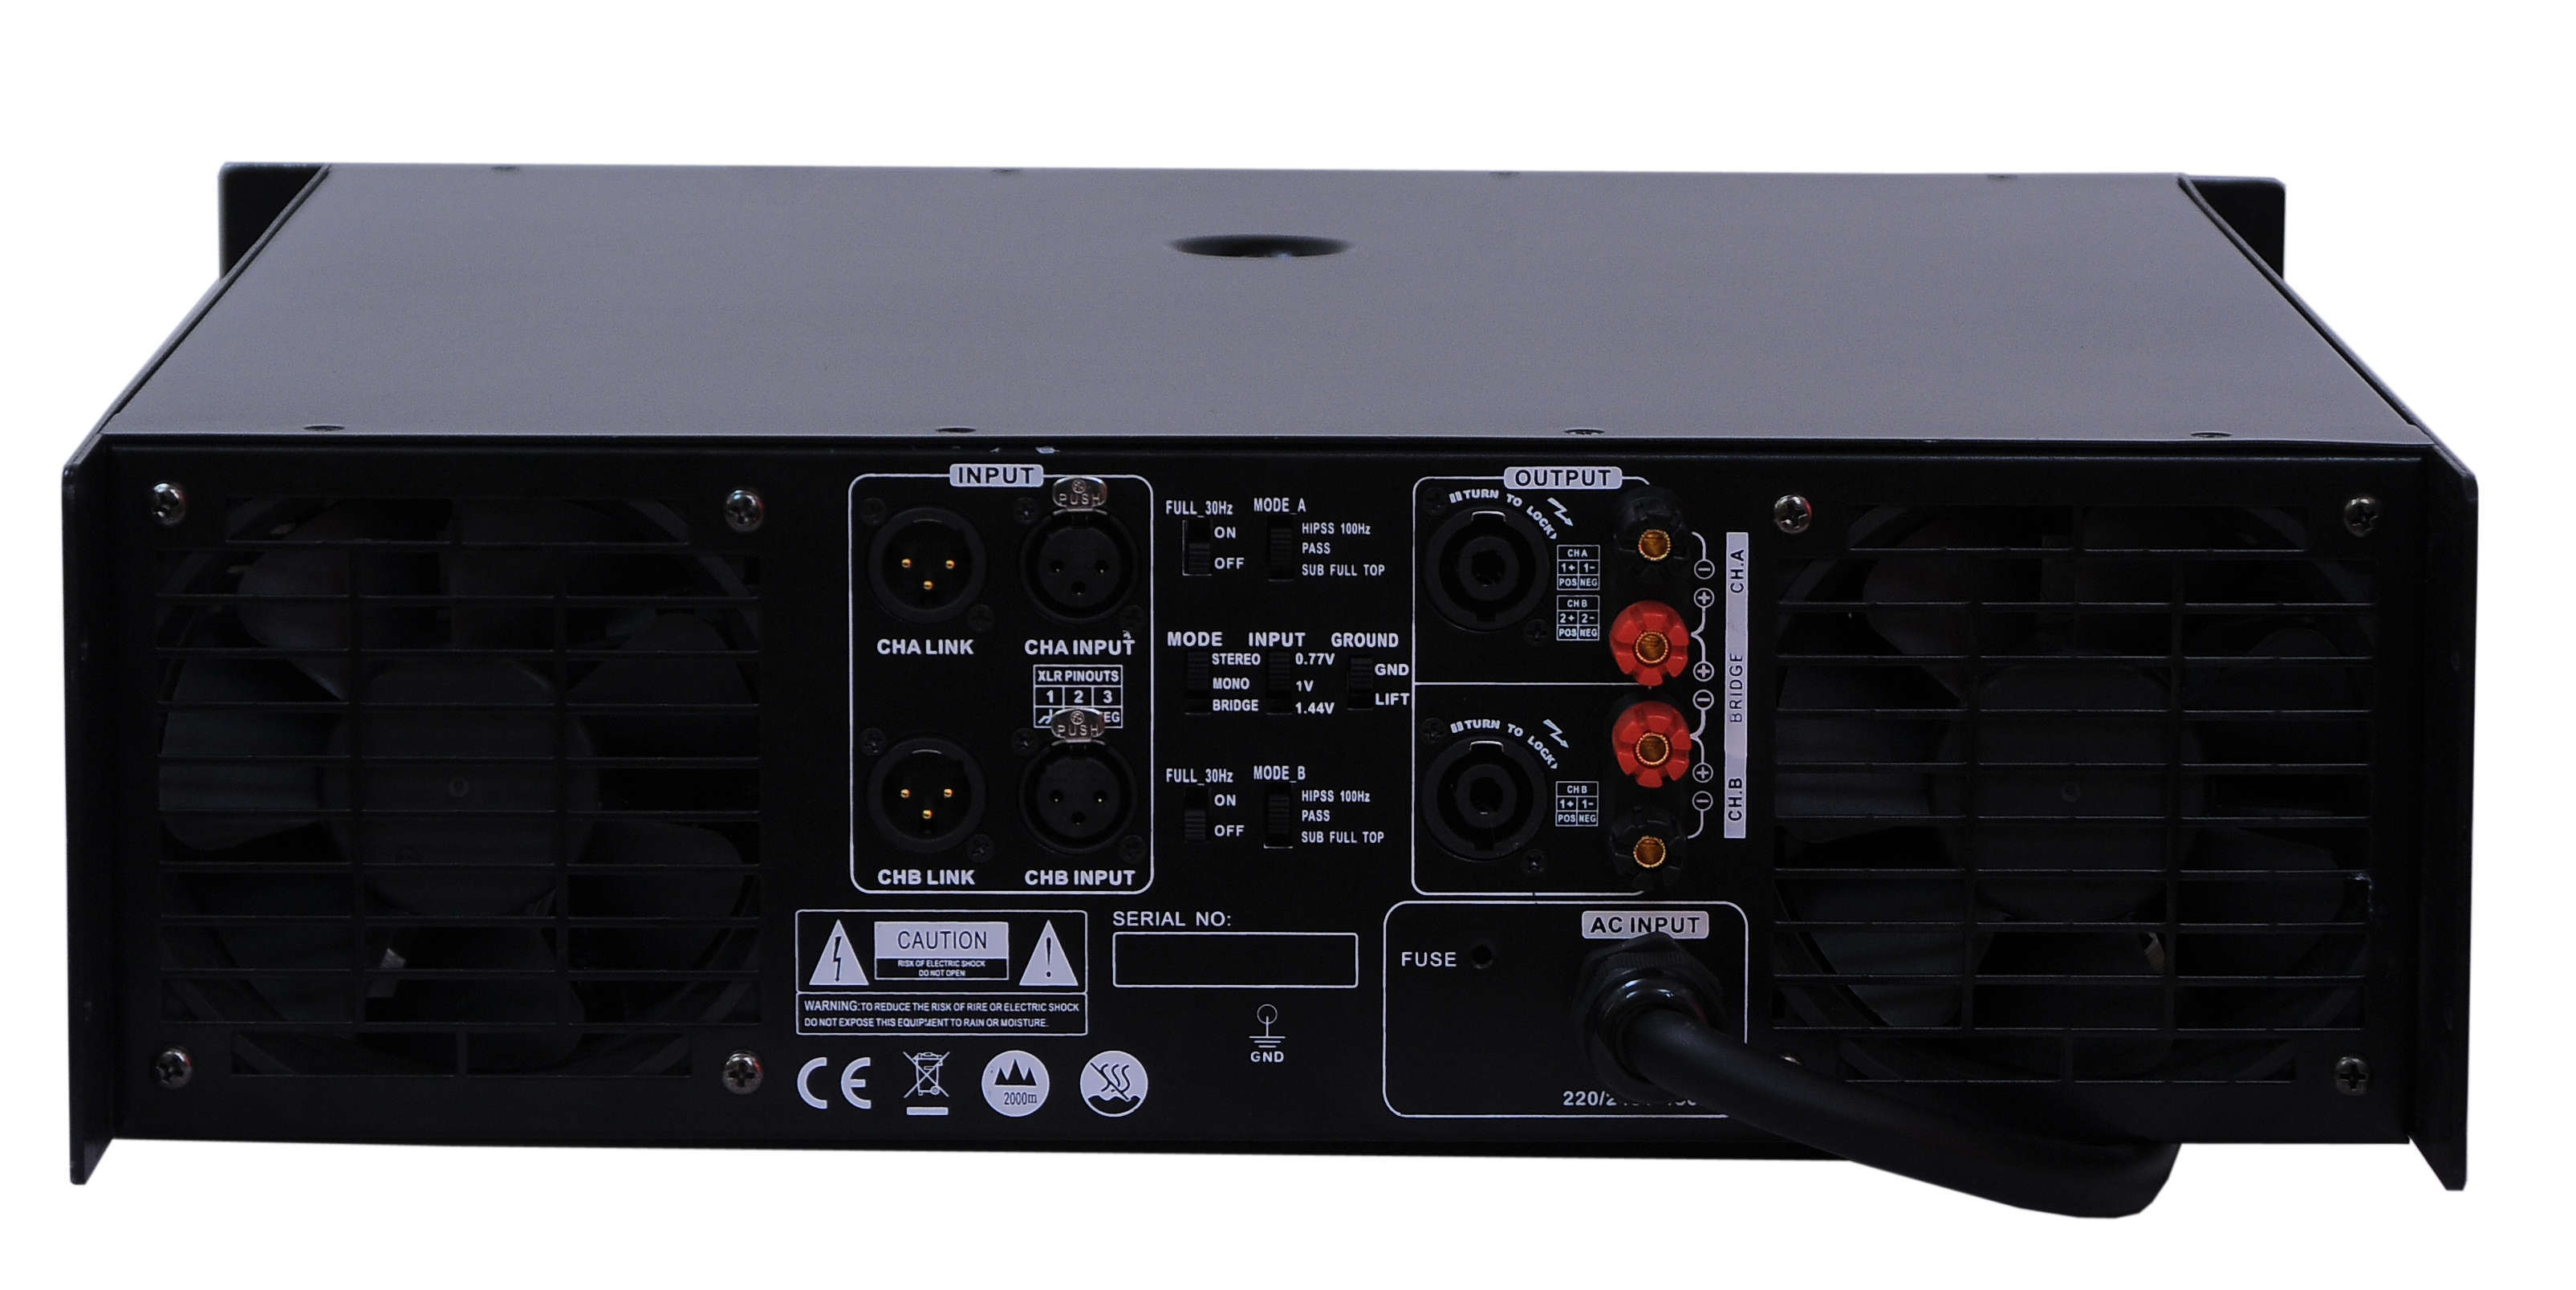 Aq Series, 3u Standard Cabinet, 2 Channels Professional Power Amplifier